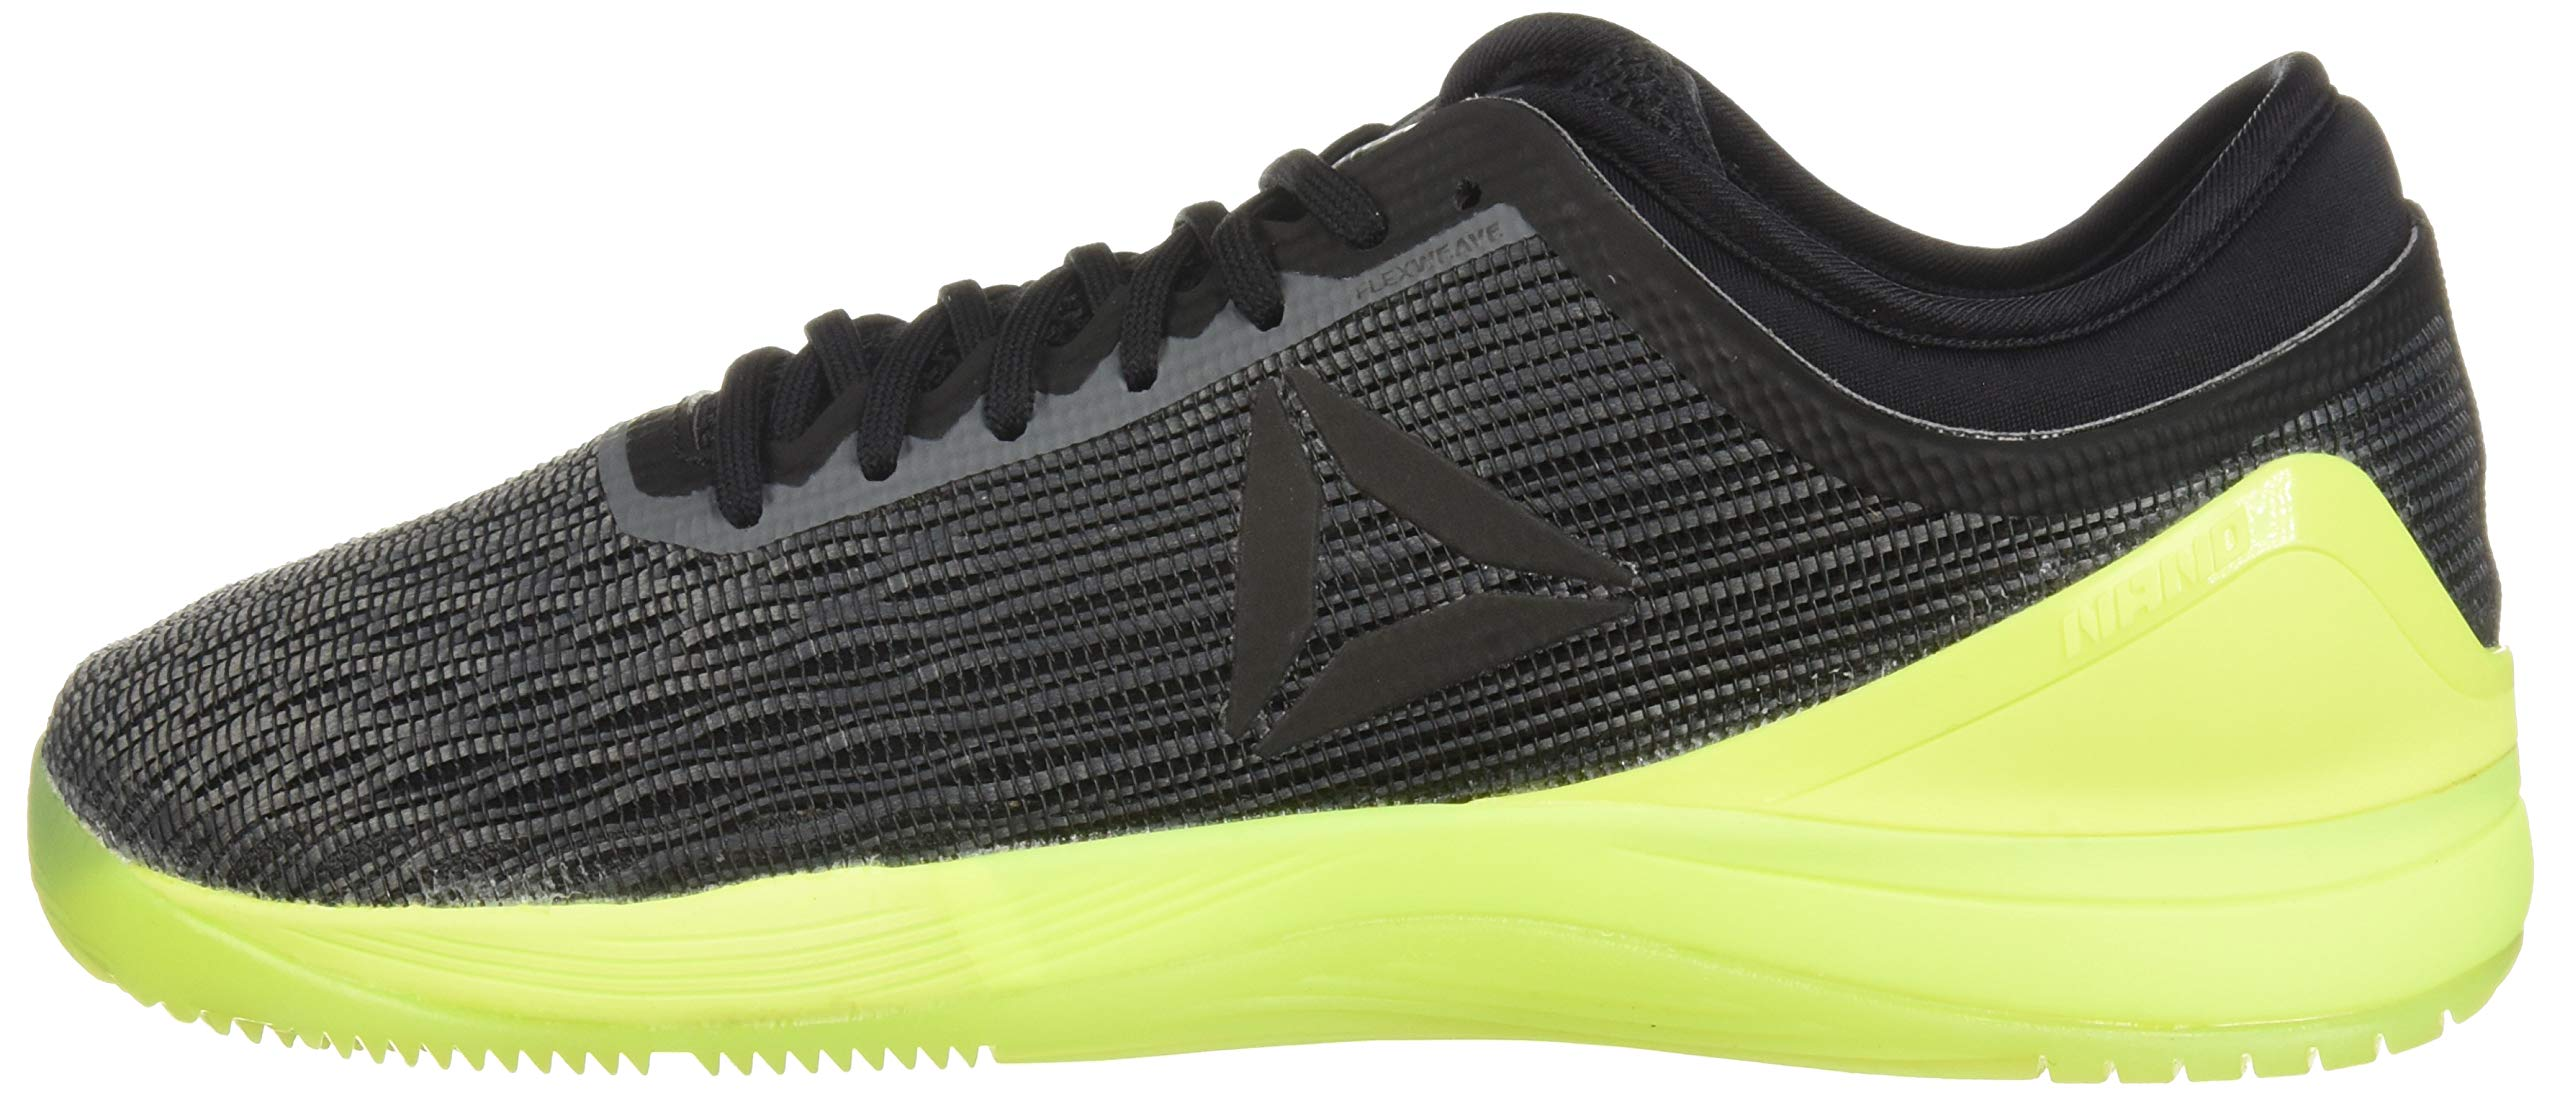 Reebok Men's CROSSFIT Nano 8.0 Sneaker, Alloy/Black/Solar Yellow, 6.5 M US by Reebok (Image #5)